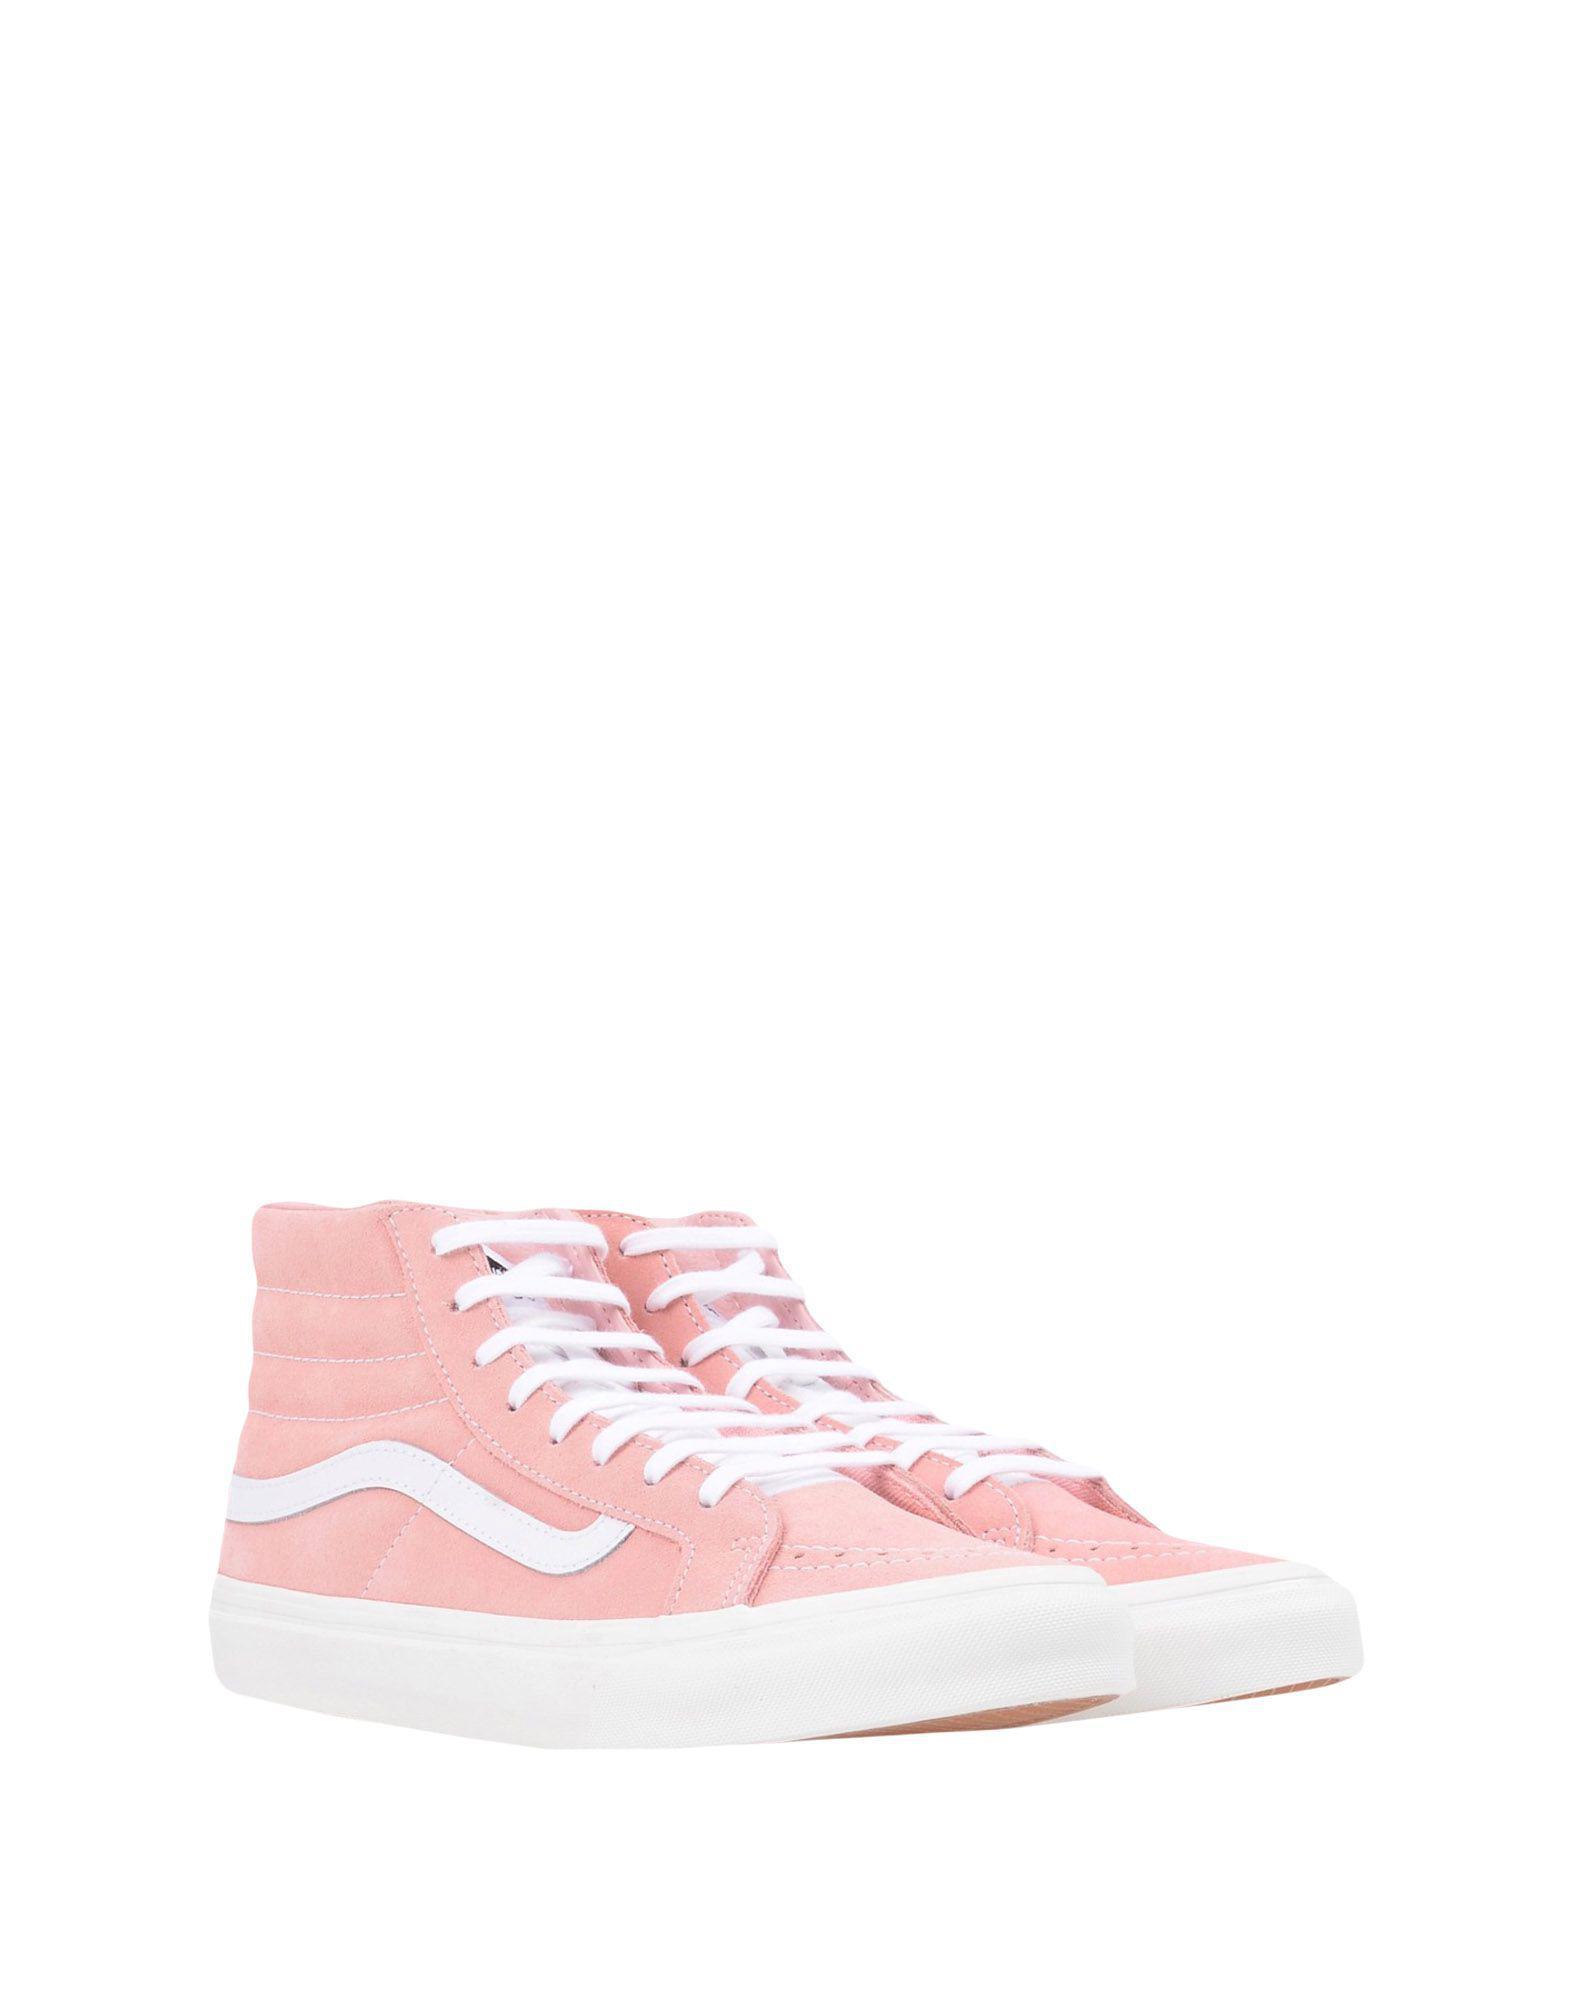 Vans Leather High-tops & Sneakers in Pink